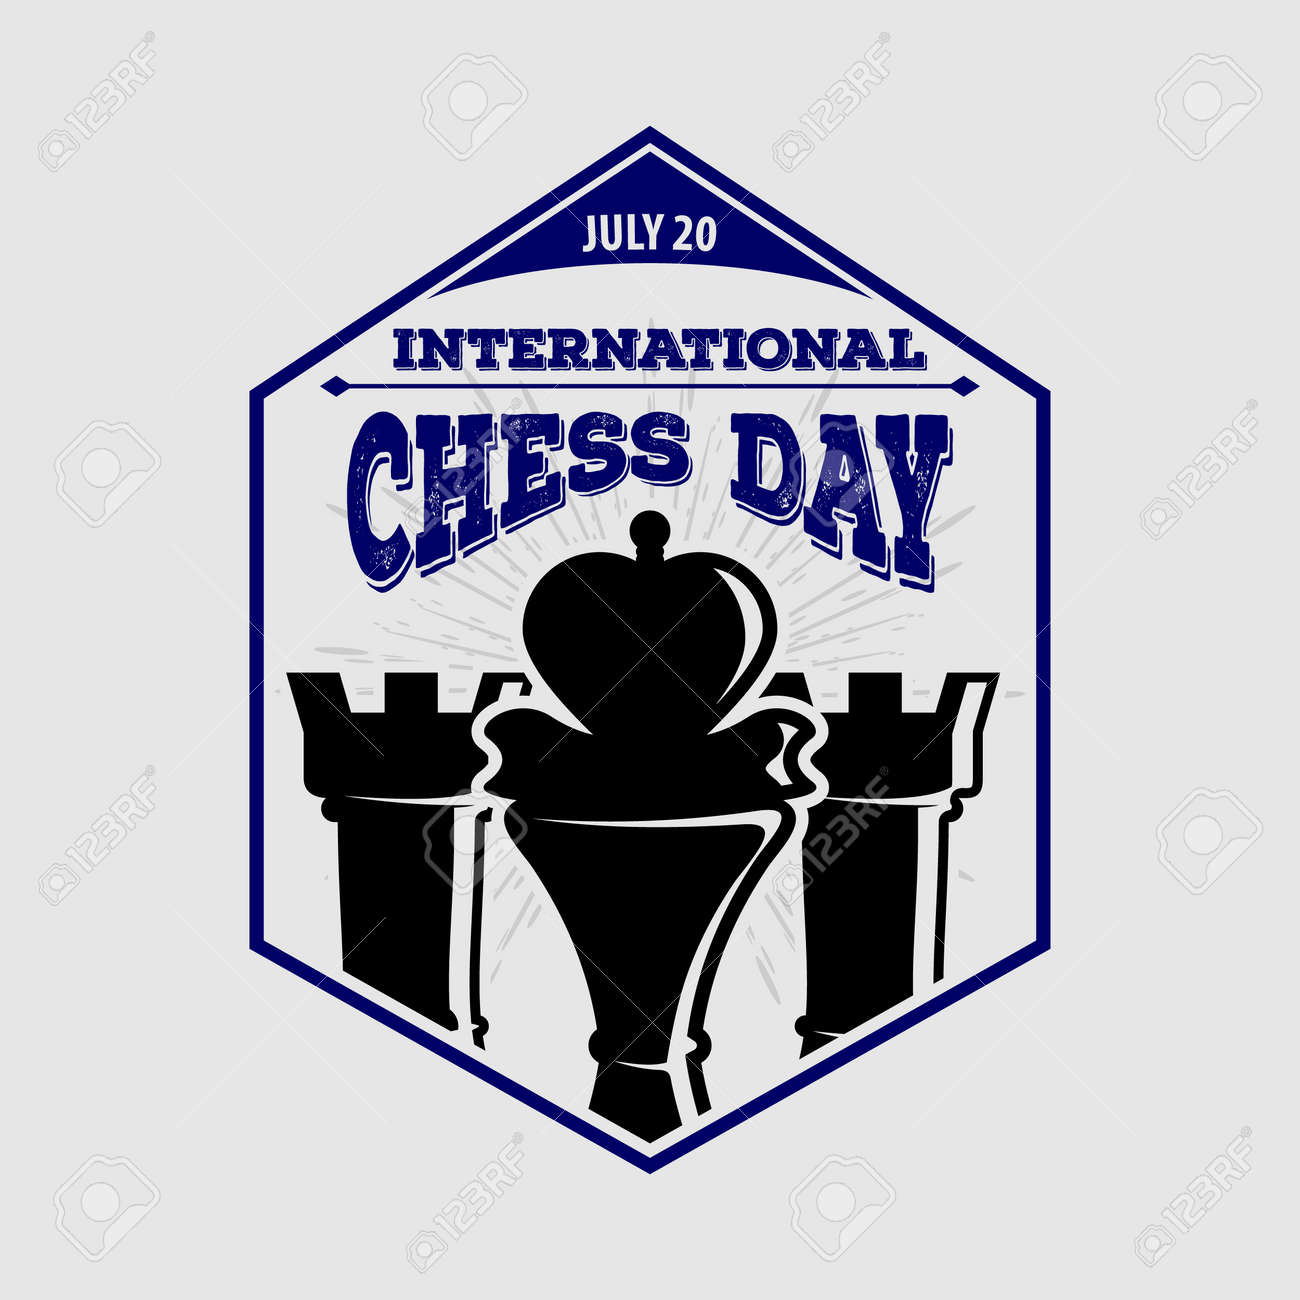 International Chess Day poster or banner design - 170170802